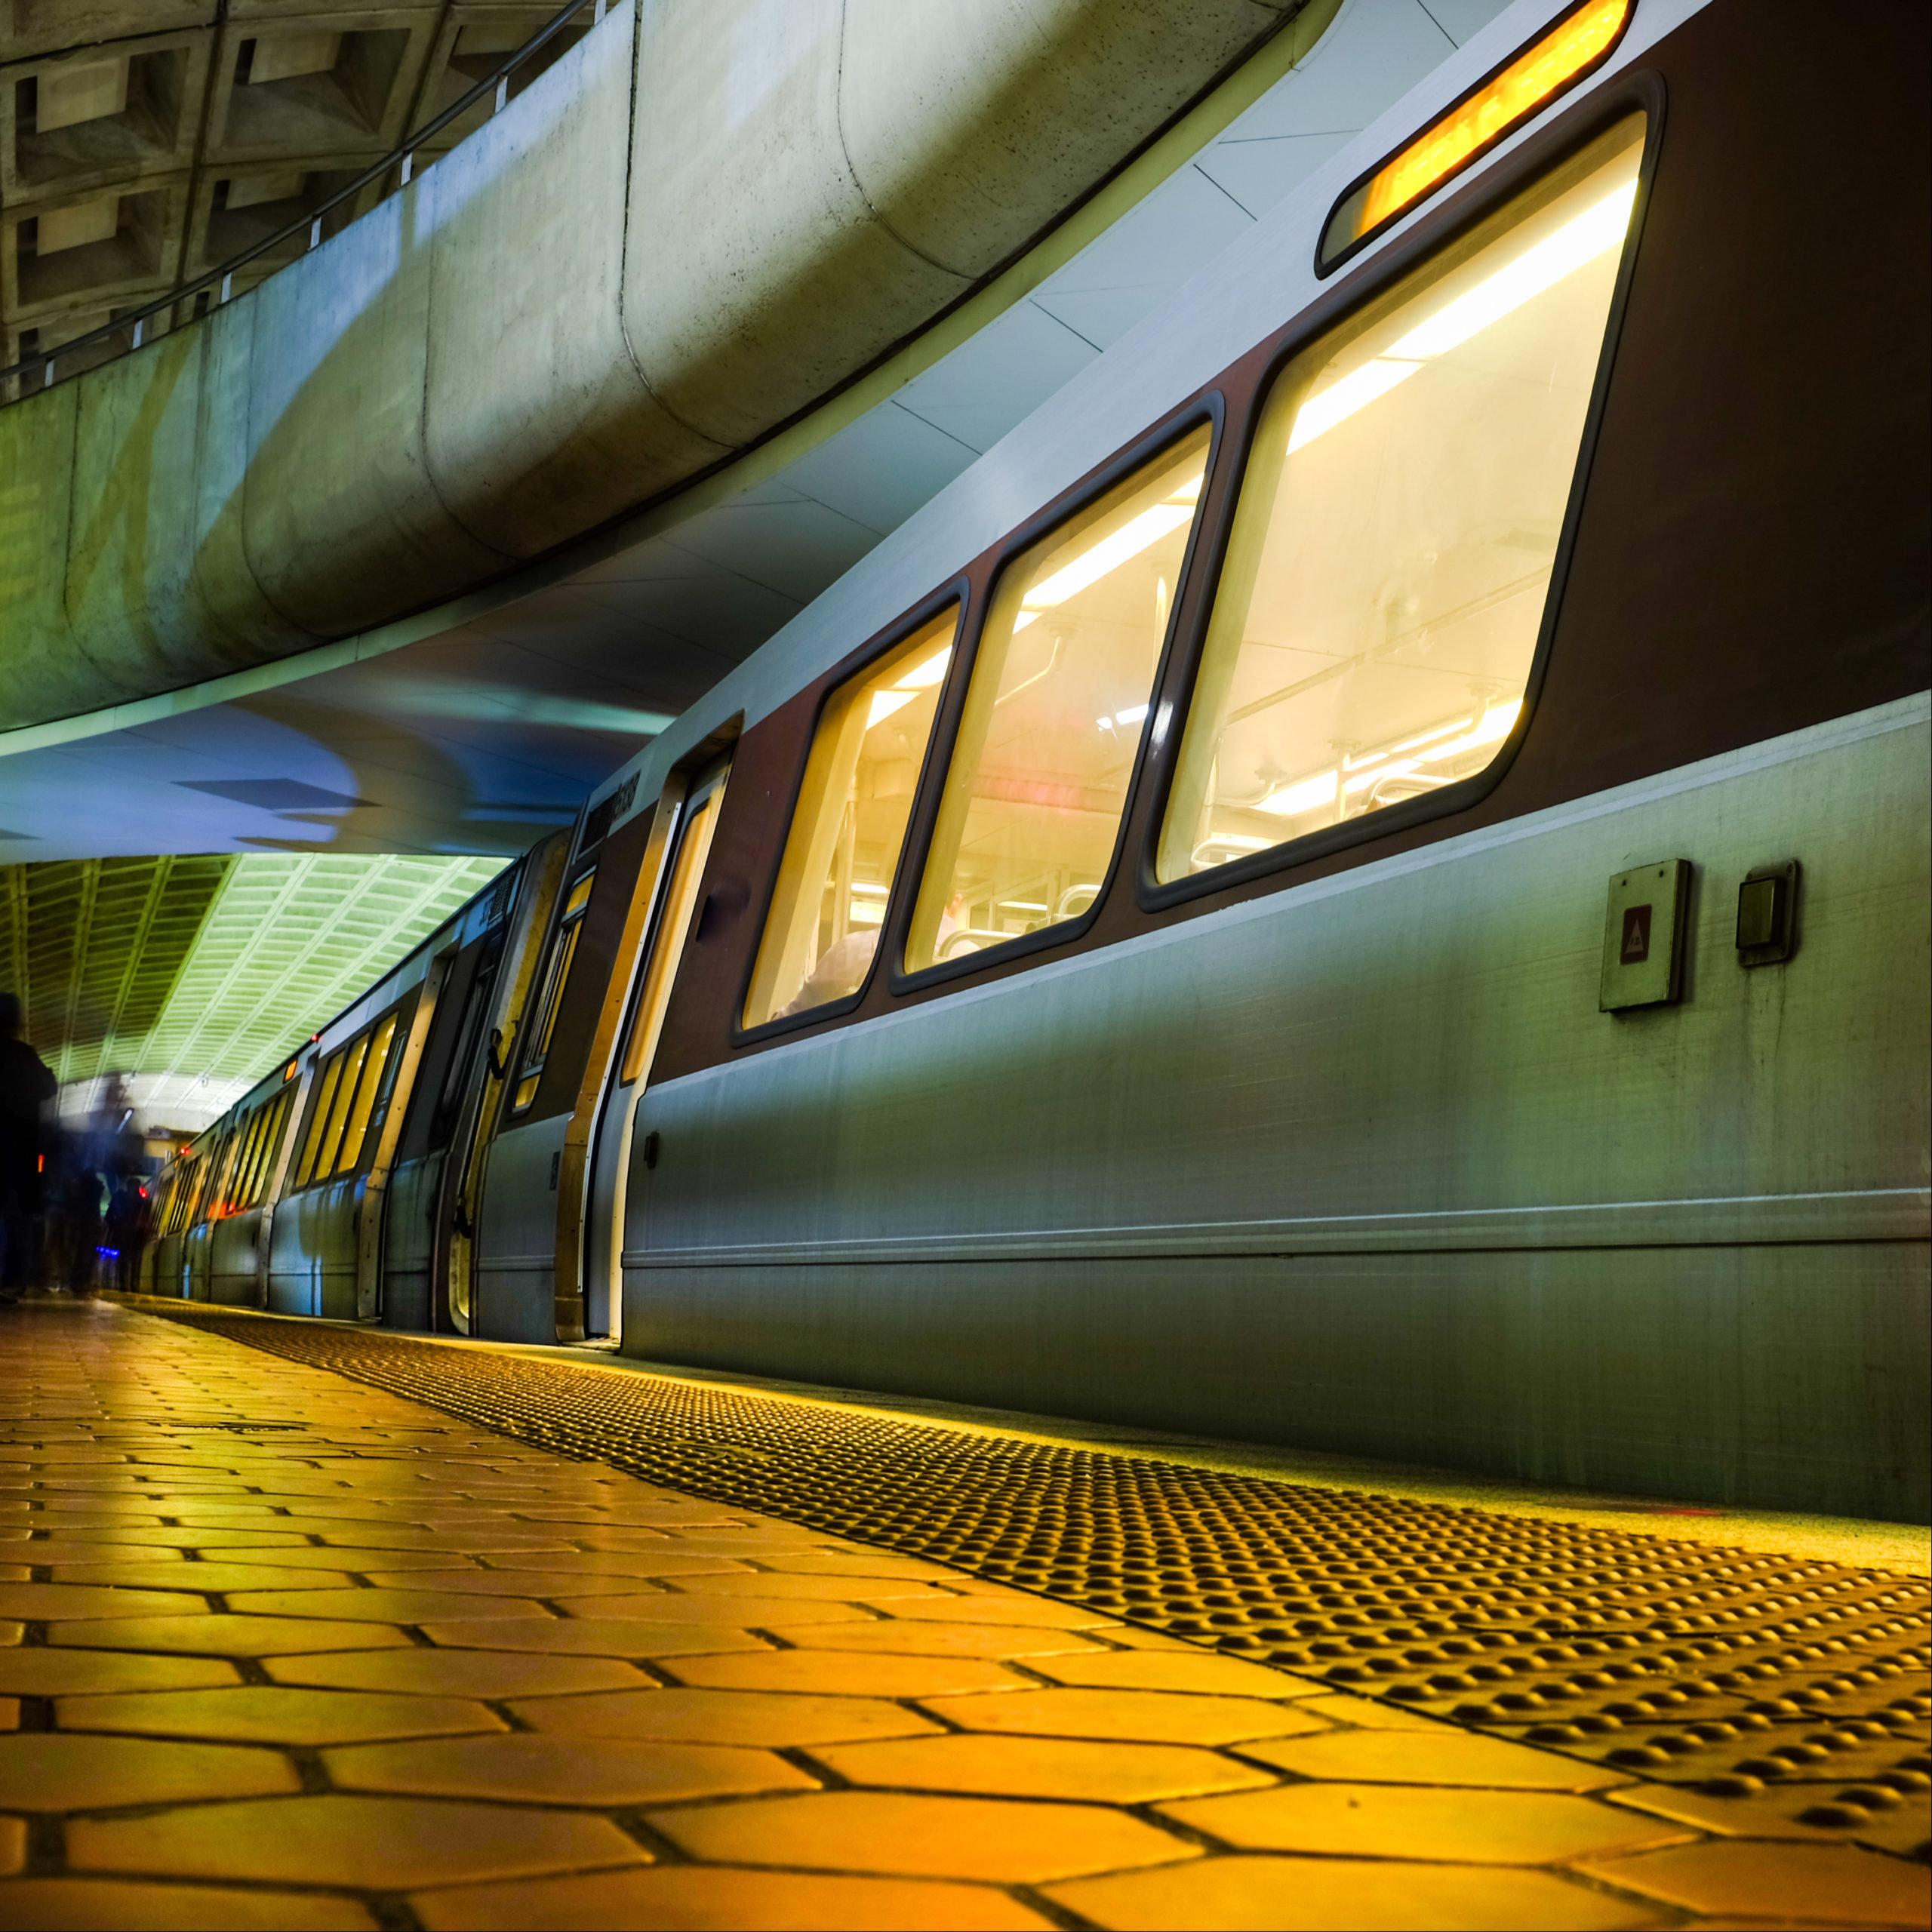 Proximity to Metro/Transit